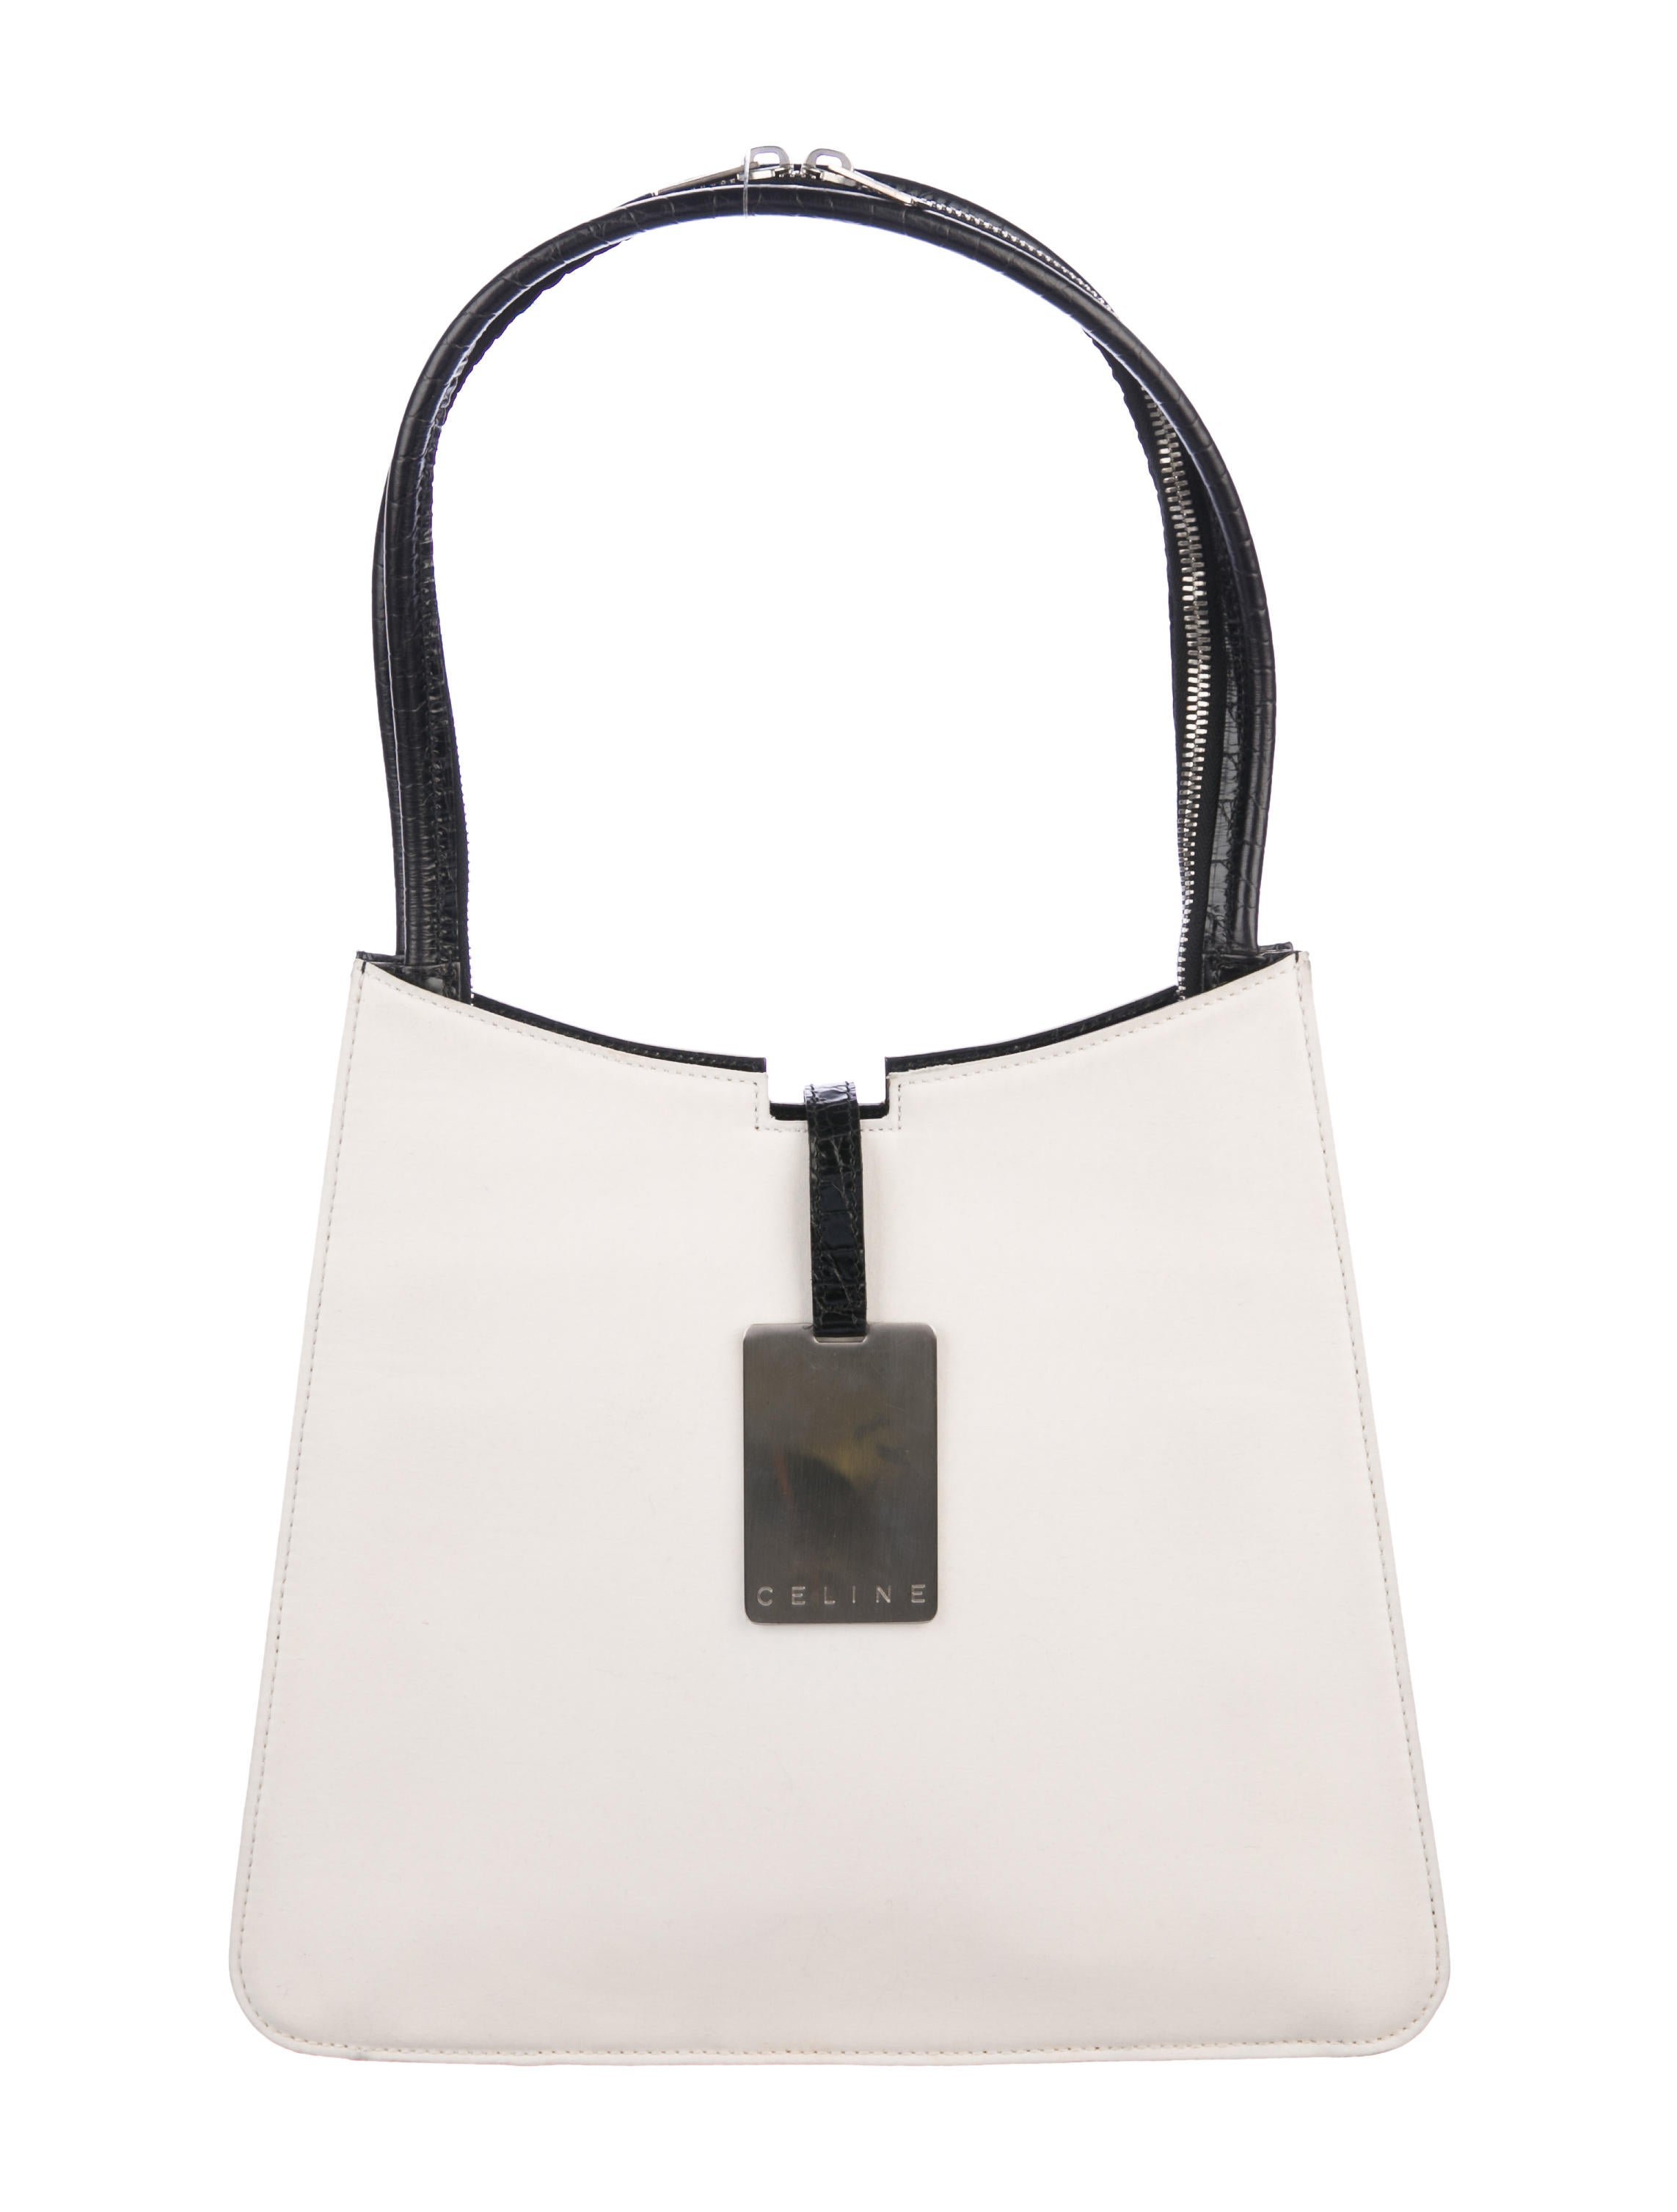 40e045e87da9 Celine Vintage Canvas Shoulder Bag - Handbags - CEL84131